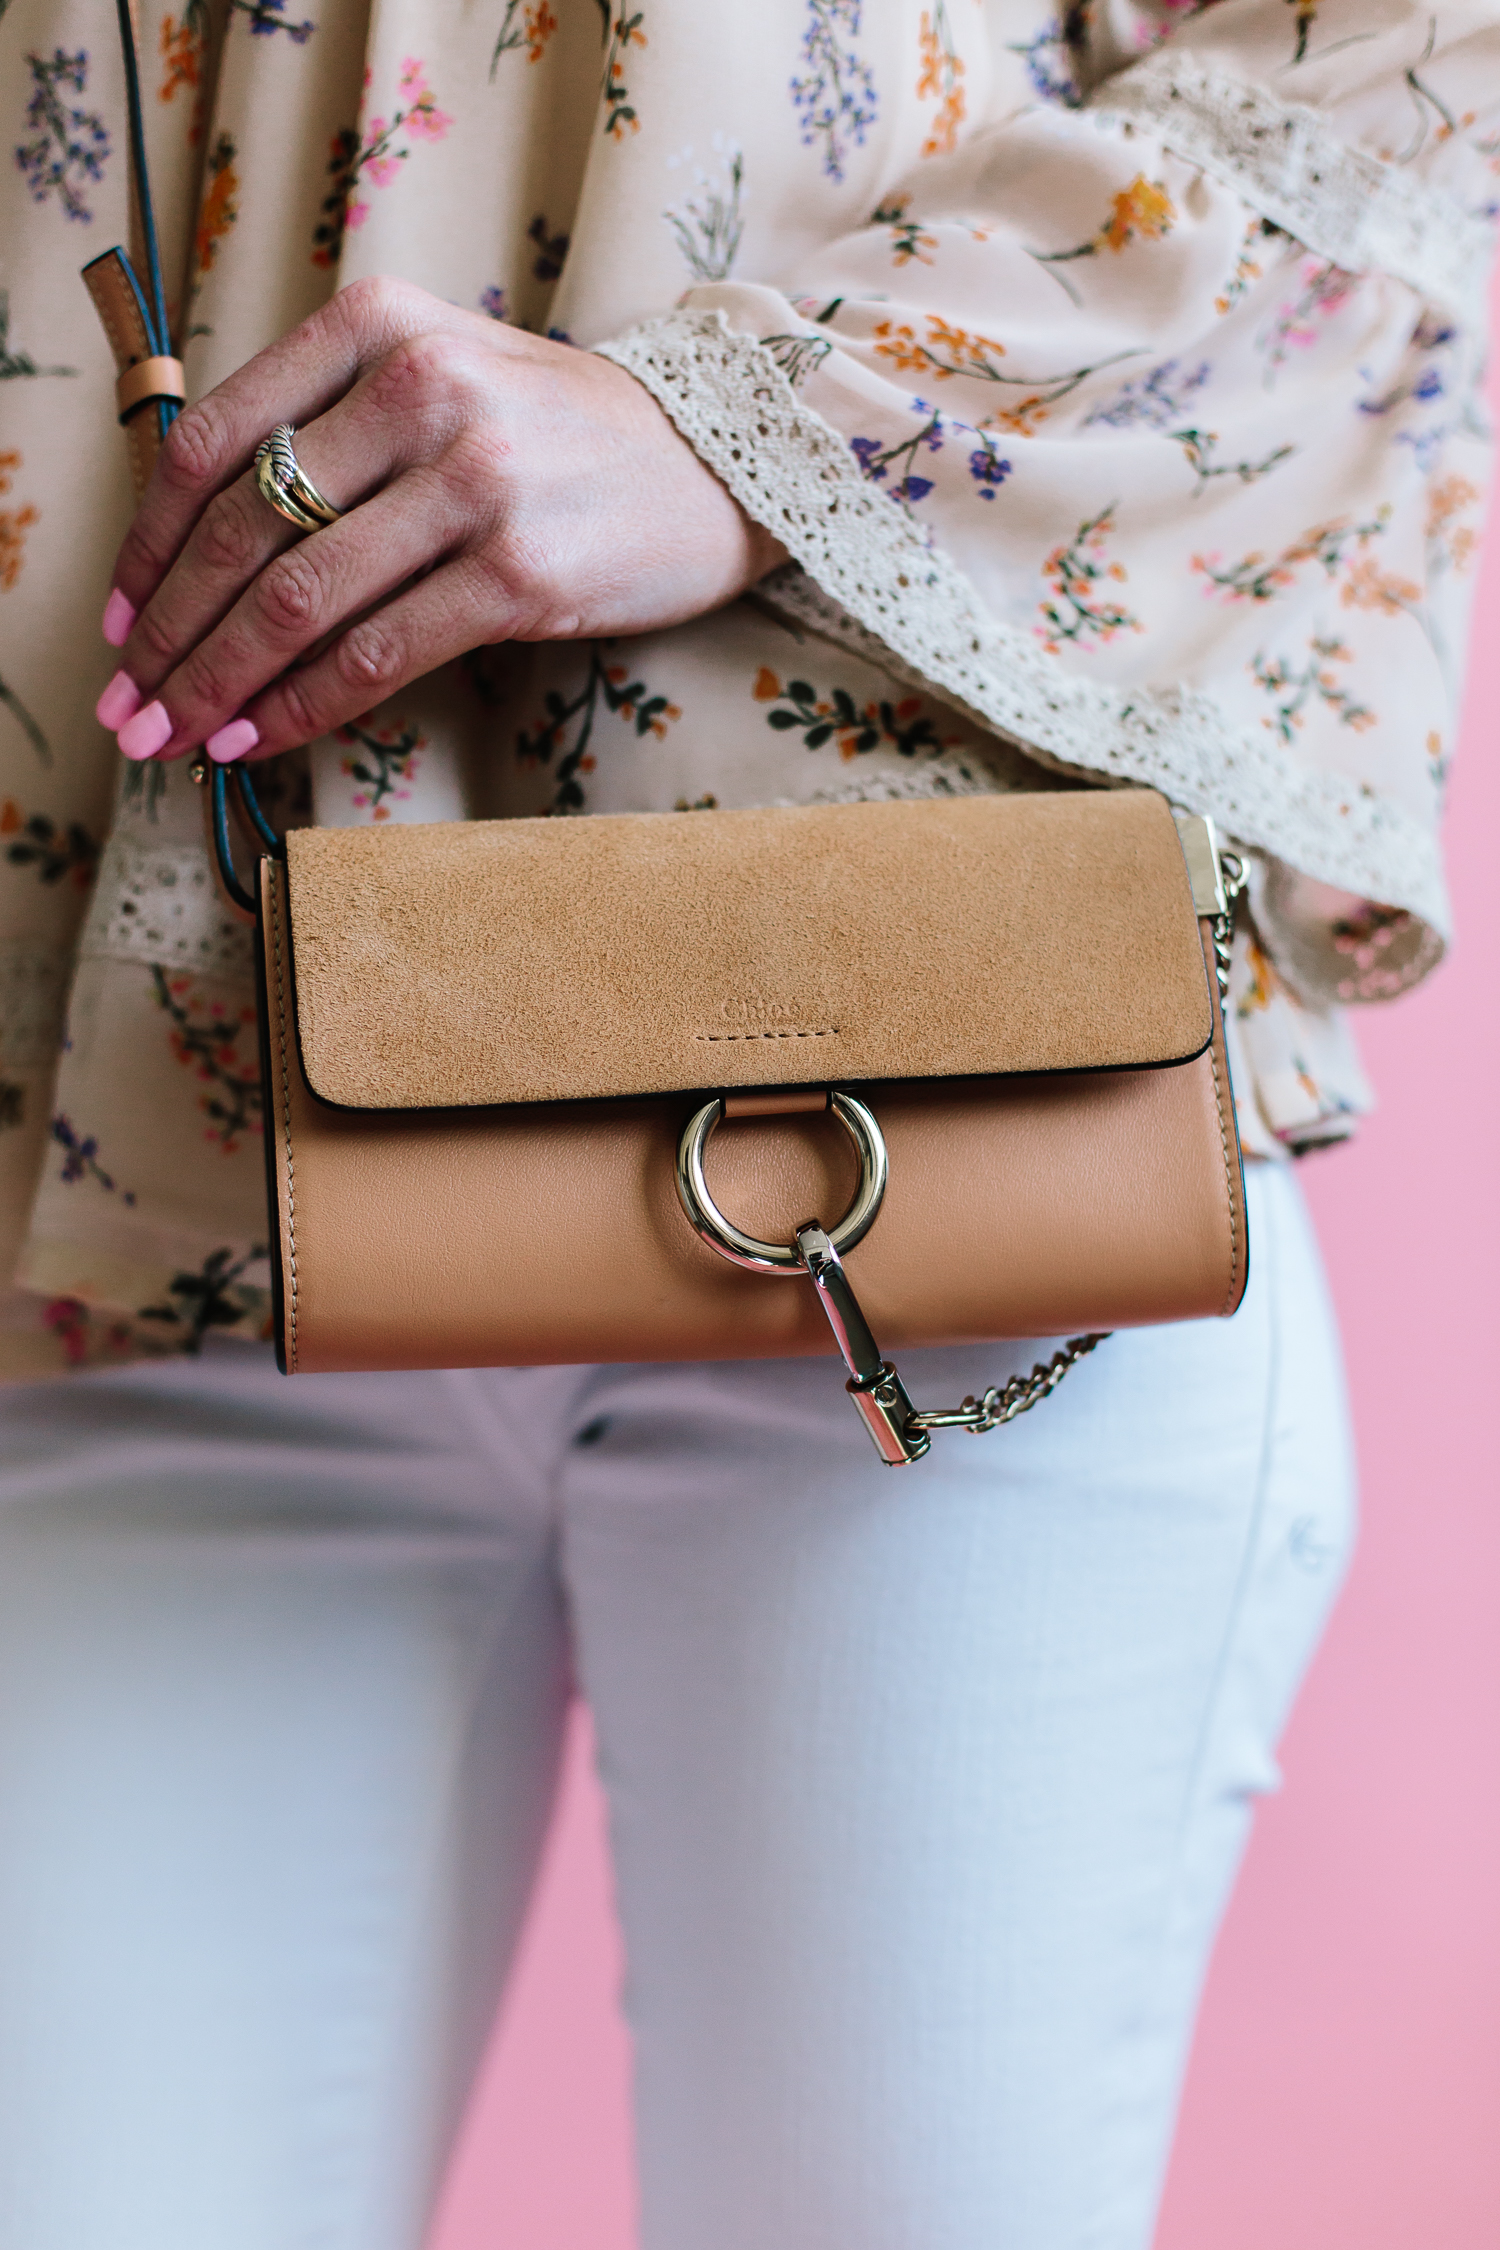 designer handbag review, designer cross body review, gucci handbag, chloe handbag, mytheresa